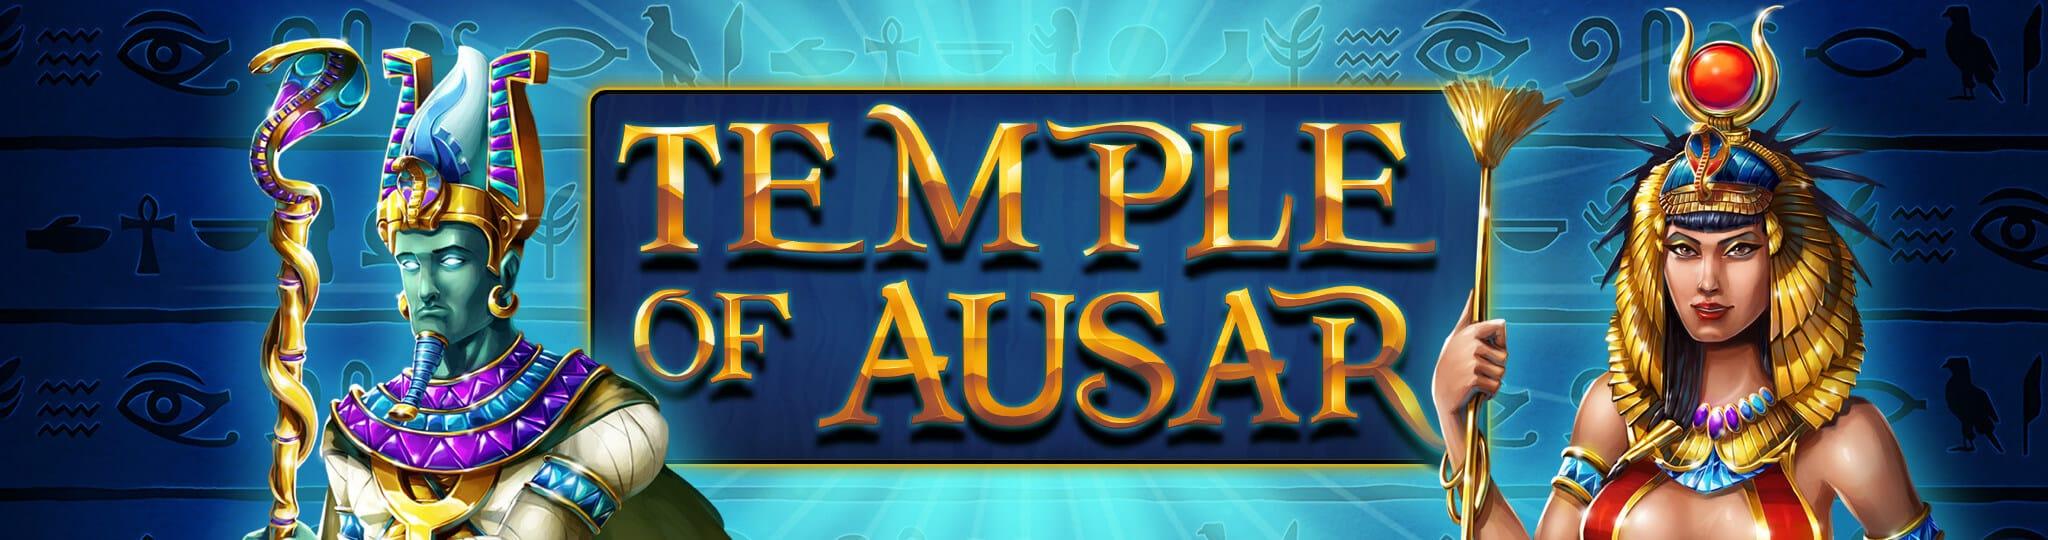 Temple of Ausar Logo